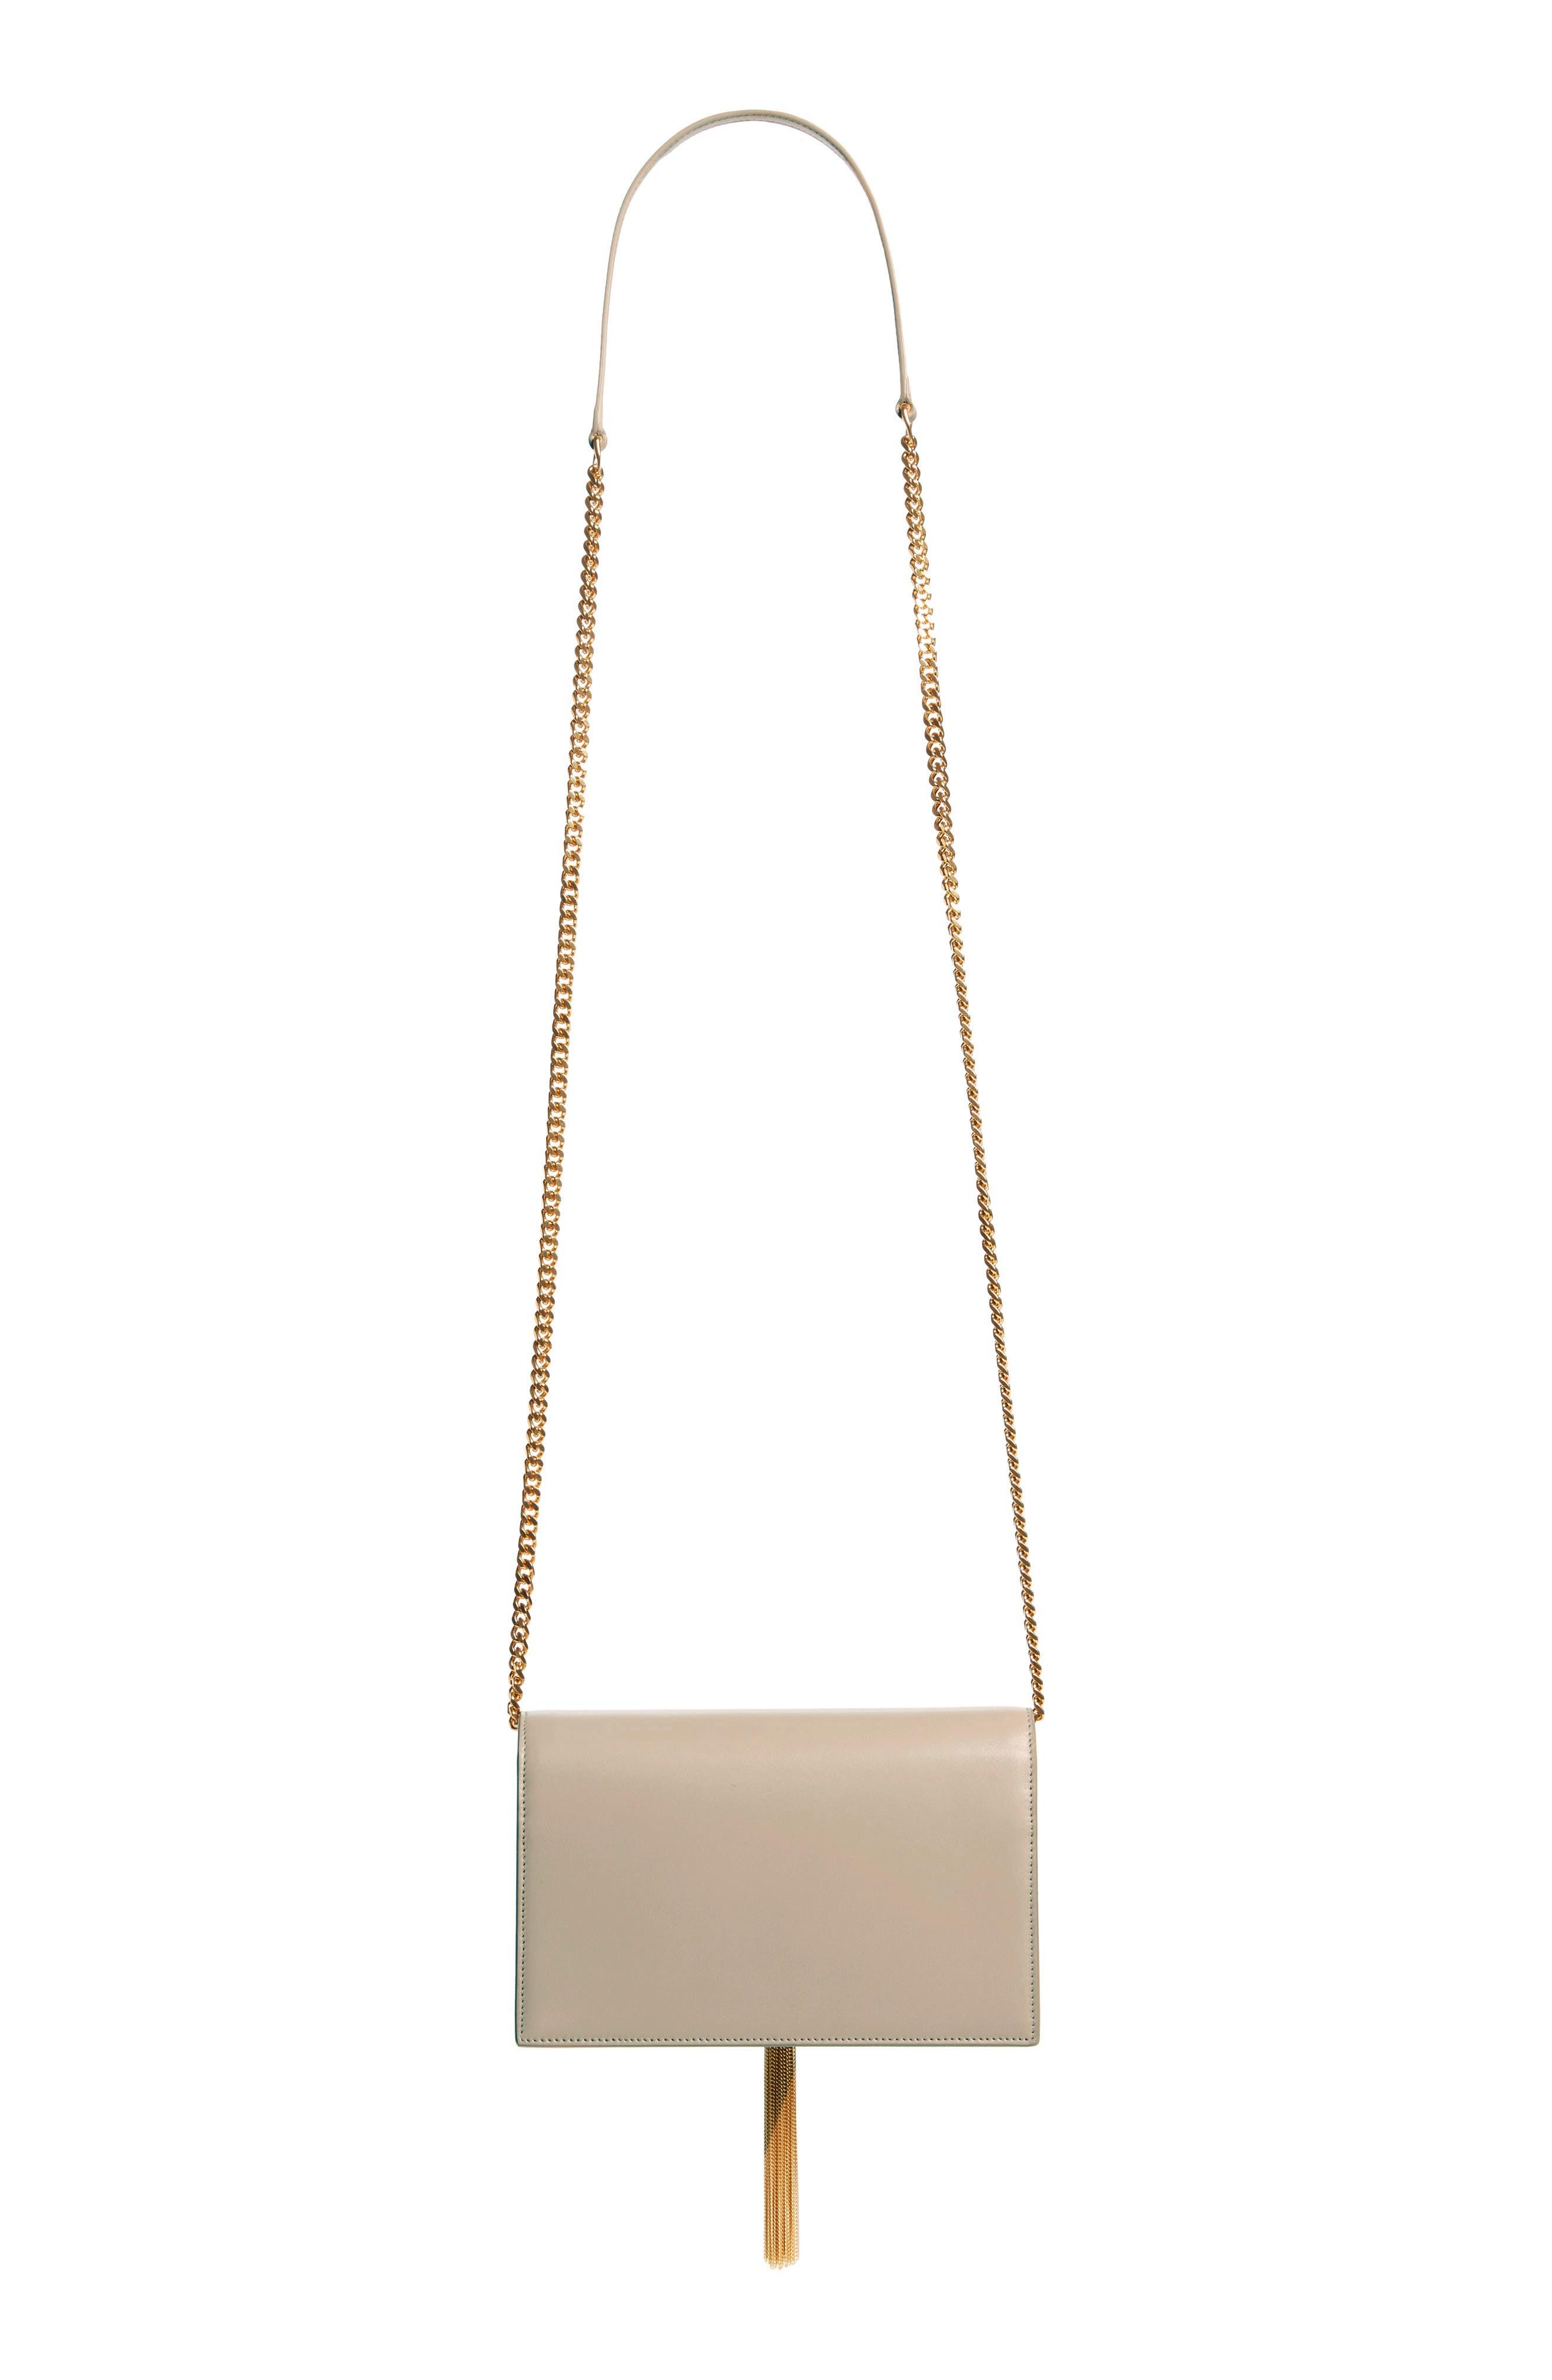 SAINT LAURENT,                             Small Monogram Calfskin Leather Wallet on a Chain,                             Alternate thumbnail 3, color,                             LIGHT NATURAL